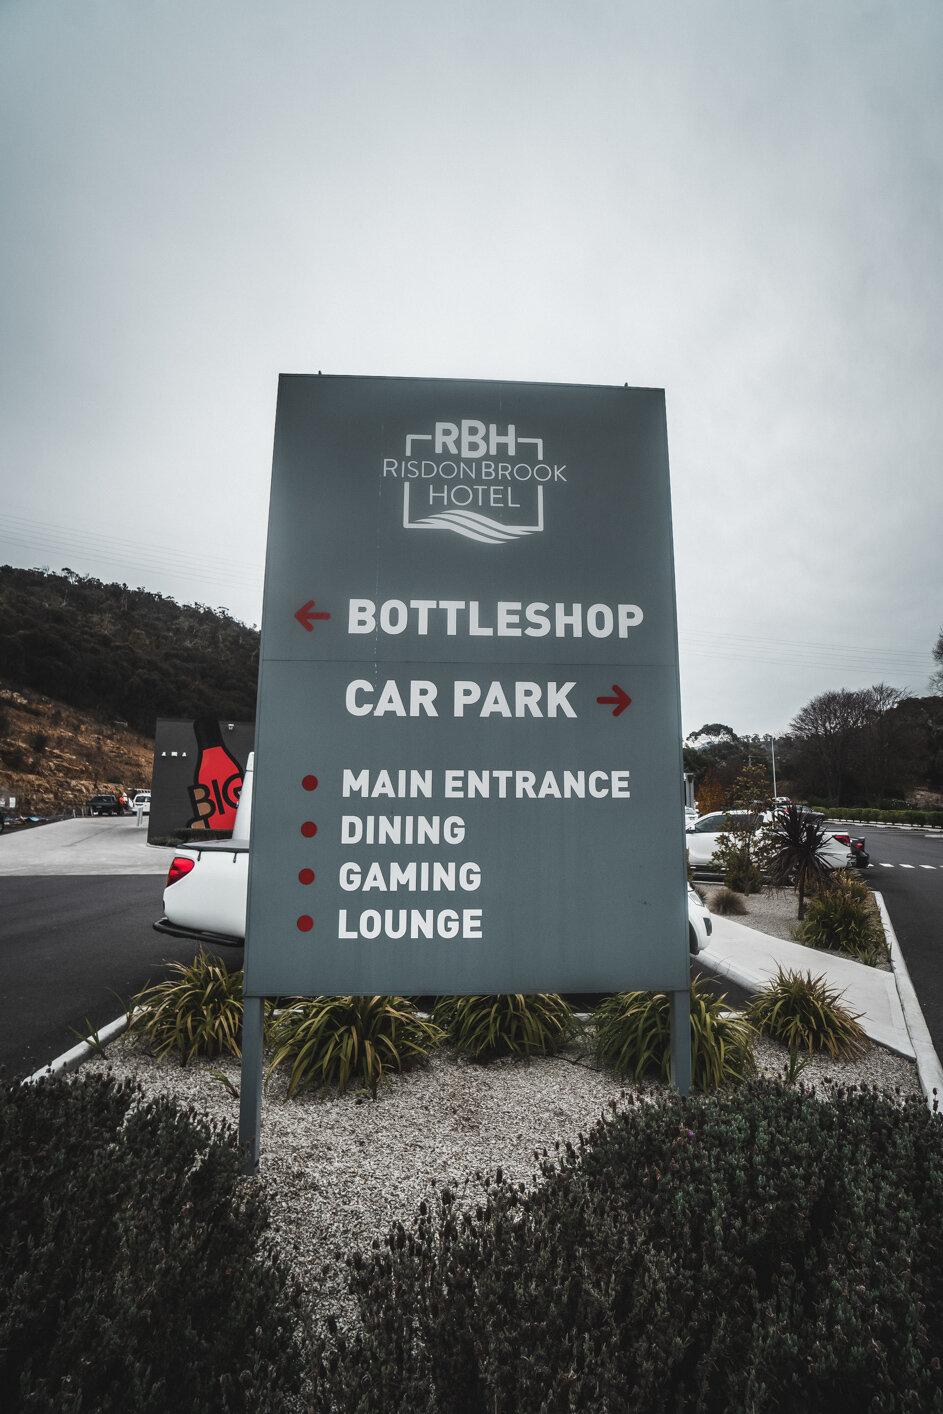 Risdon Brook Hotel (Web) (23 of 24).jpg